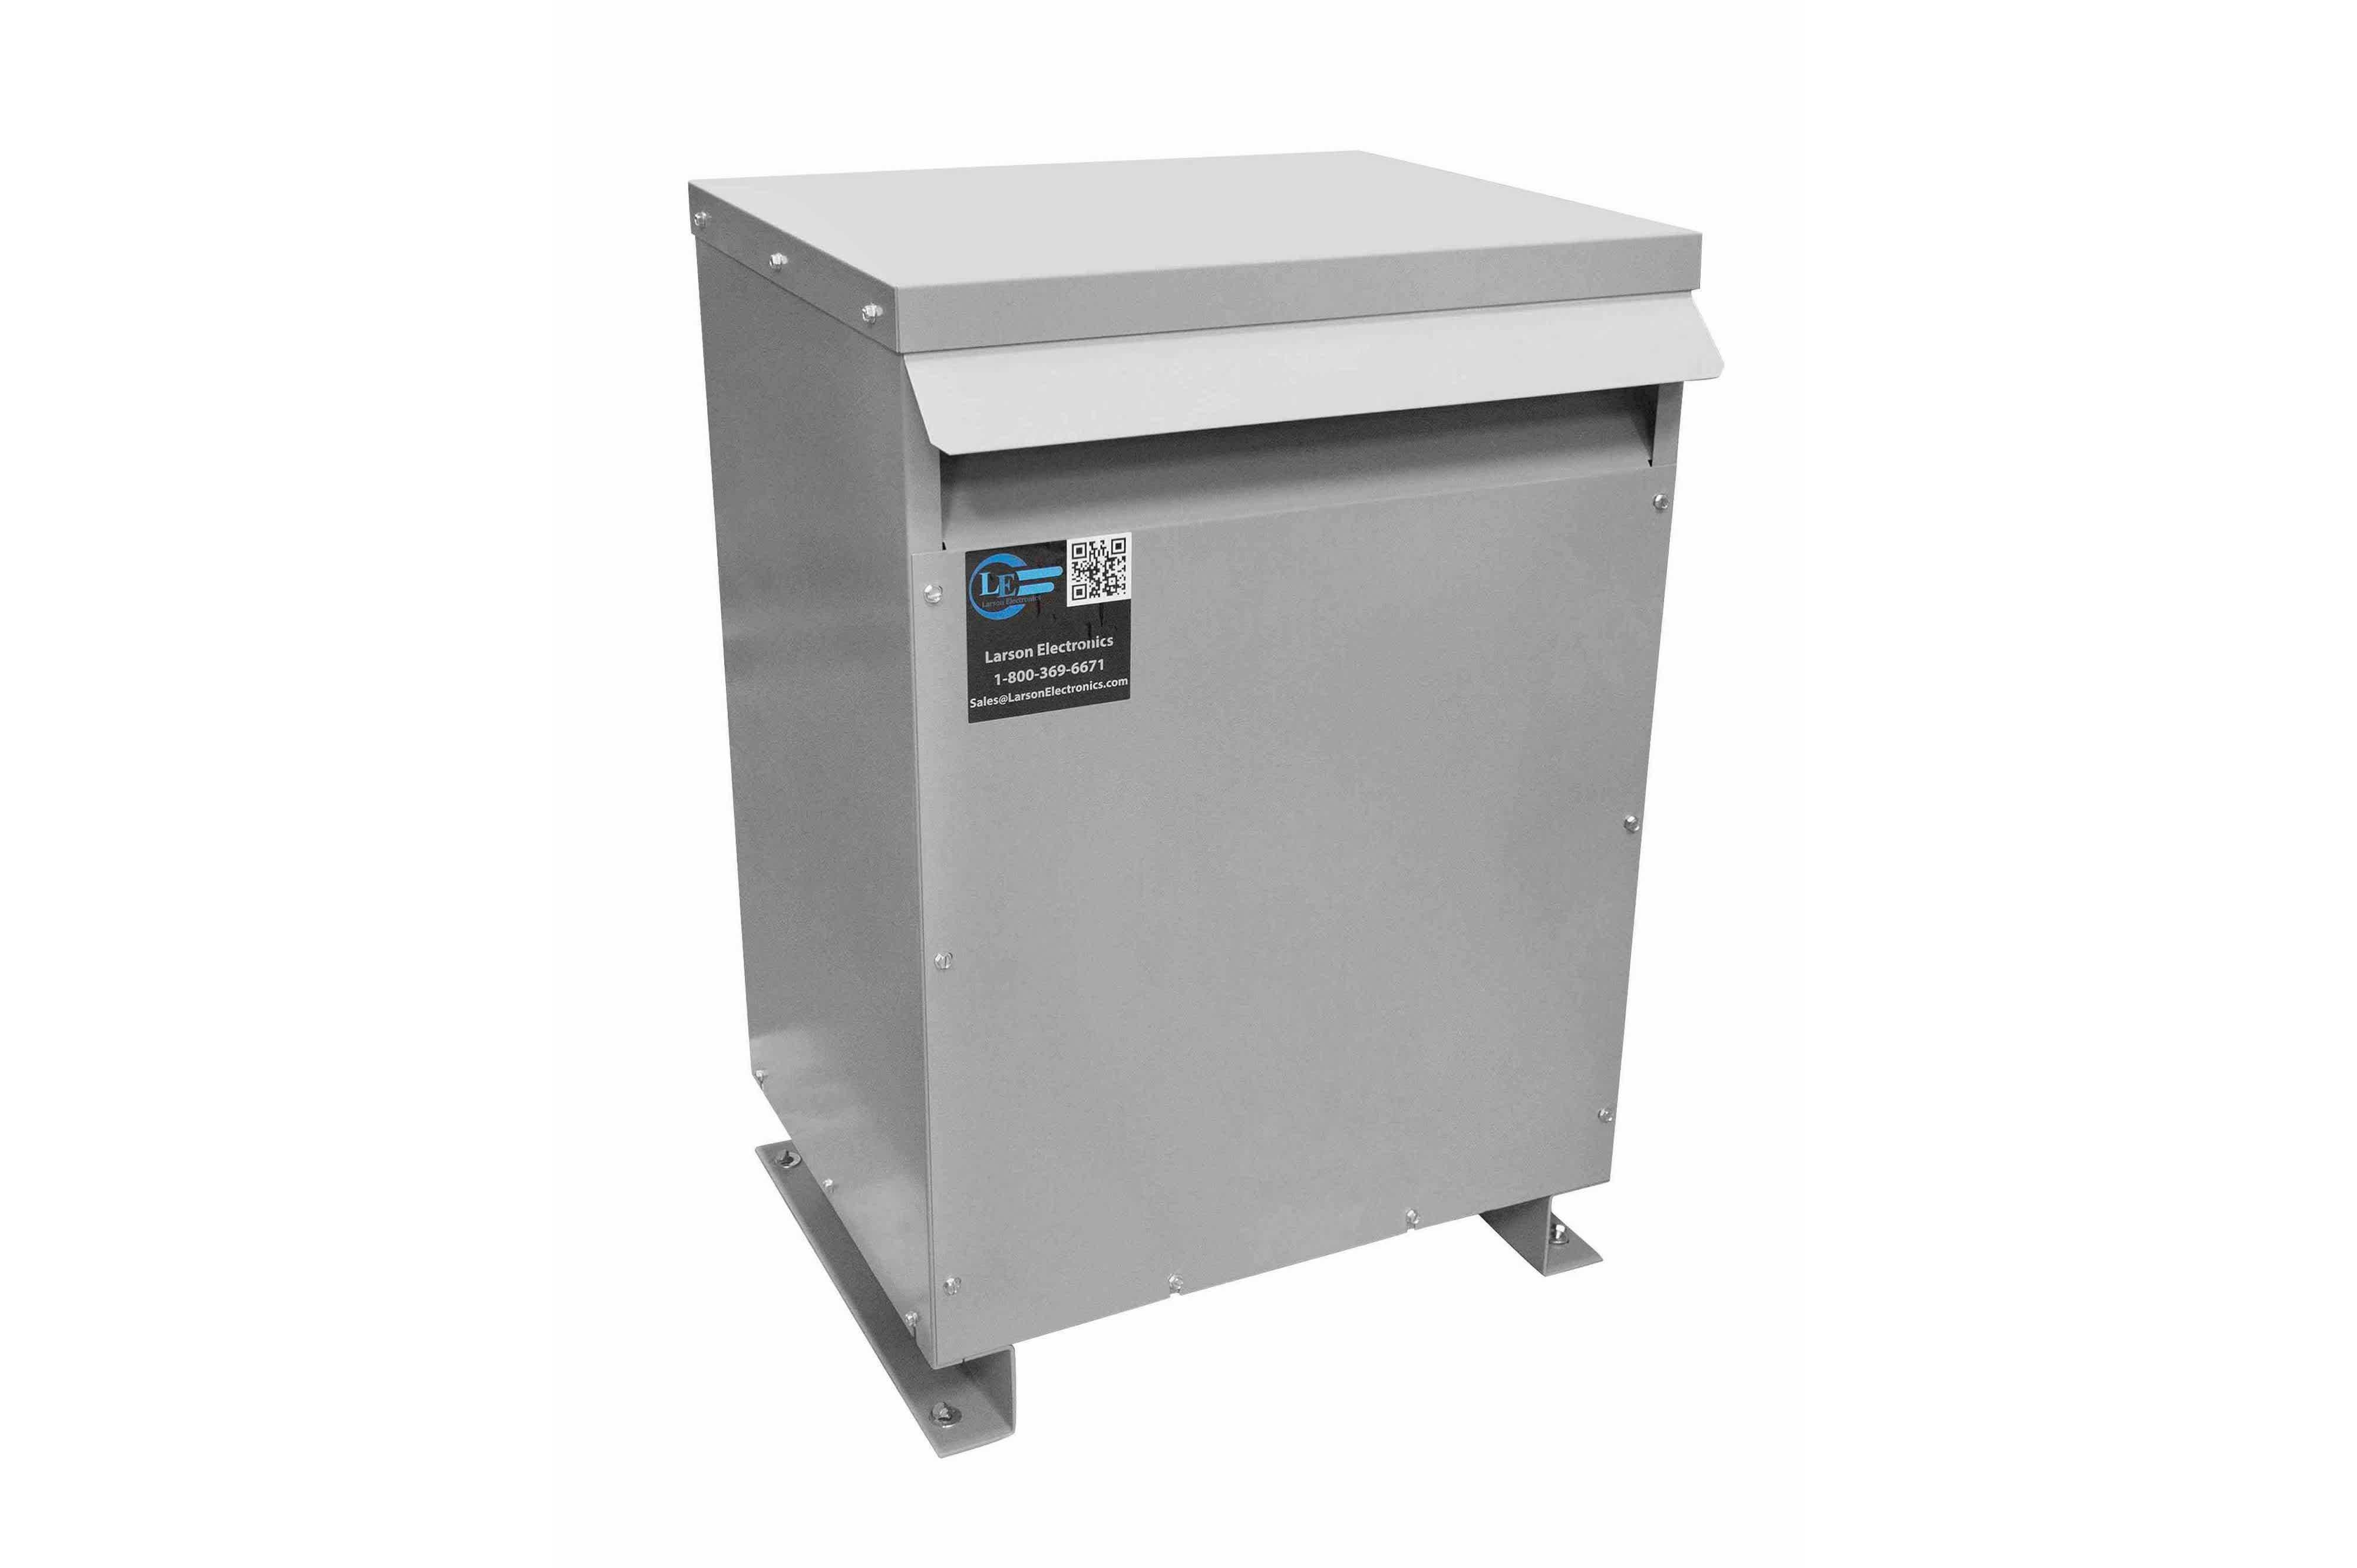 55 kVA 3PH Isolation Transformer, 415V Wye Primary, 240V/120 Delta Secondary, N3R, Ventilated, 60 Hz